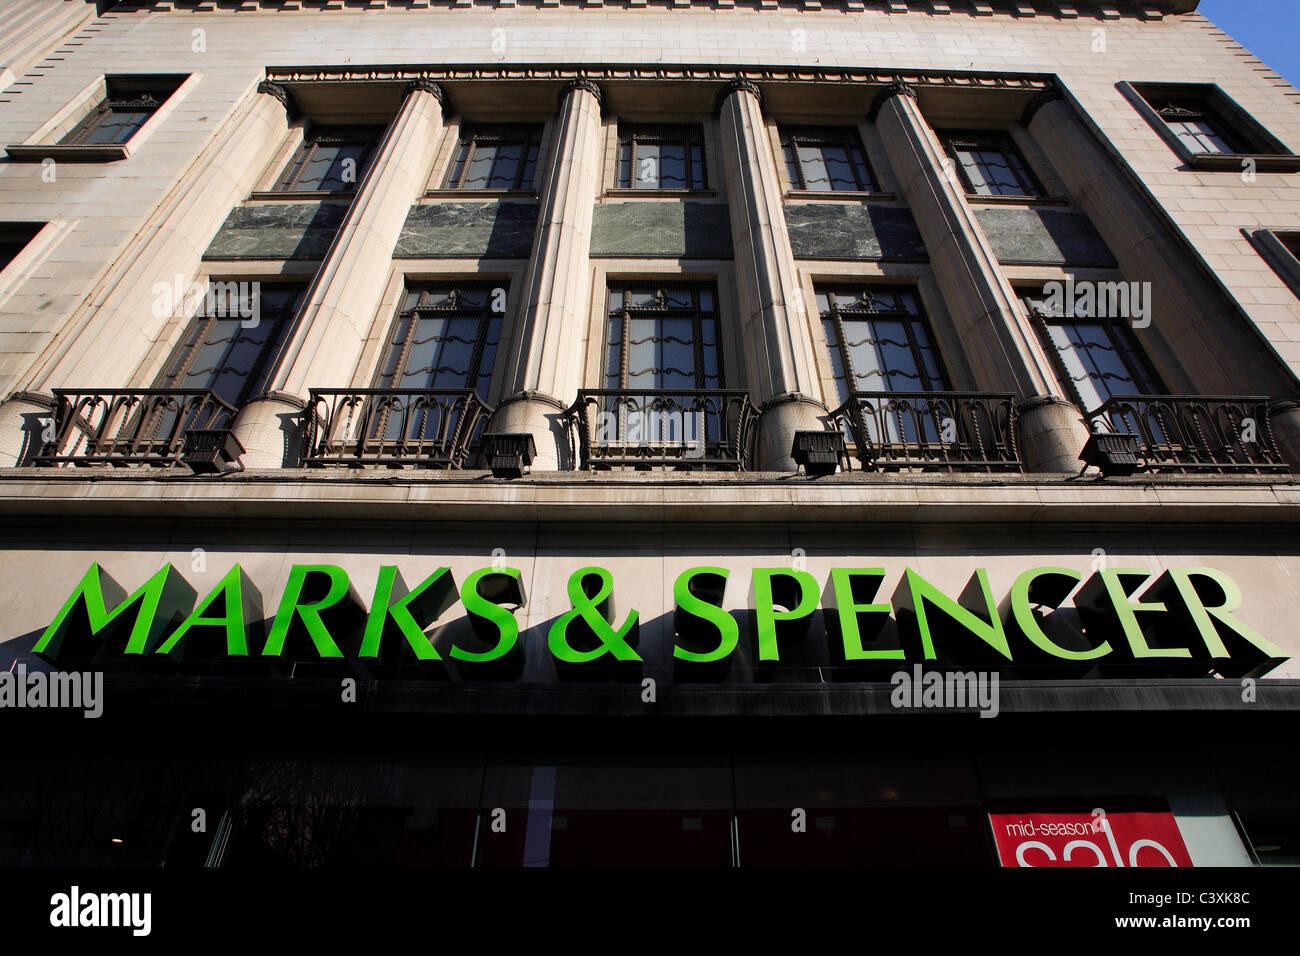 Marks & Spencer shop front, Birmingham, England, UK - Stock Image